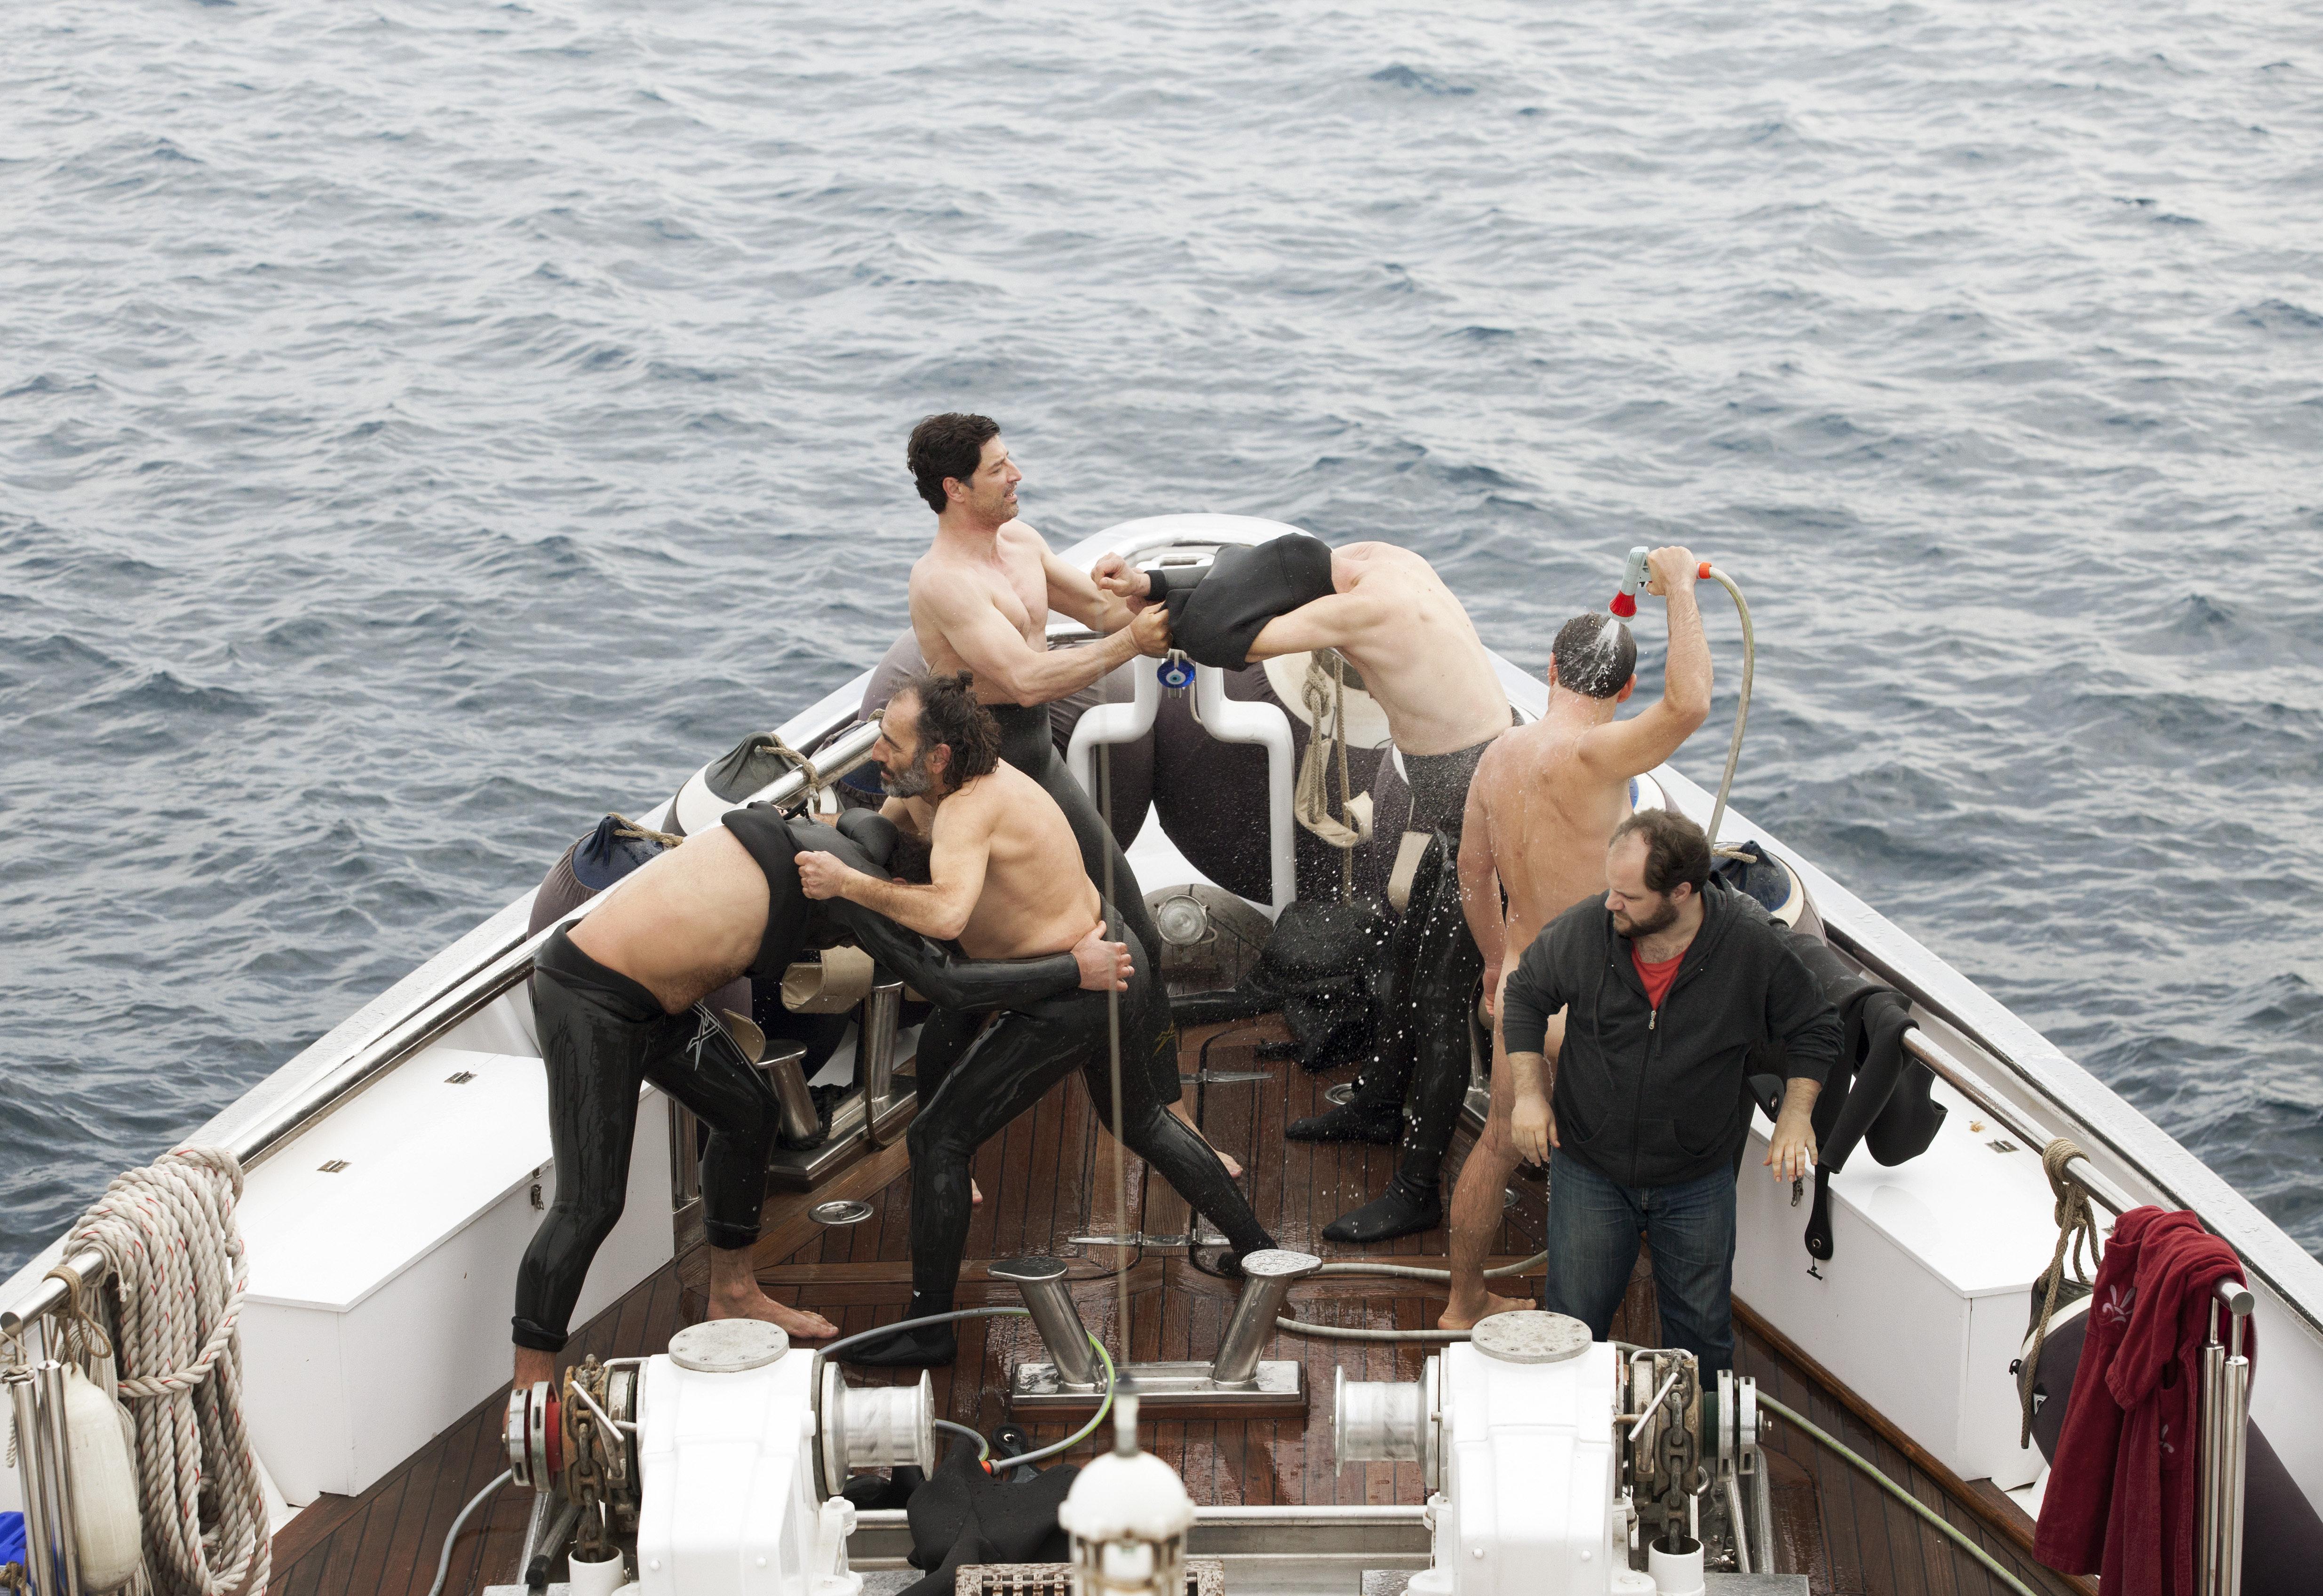 Vangelis Mourikis, Yorgos Pirpassopoulos, Yiorgos Kendros, Sakis Rouvas, Panos Koronis, and Makis Papadimitriou in Chevalier (2015)